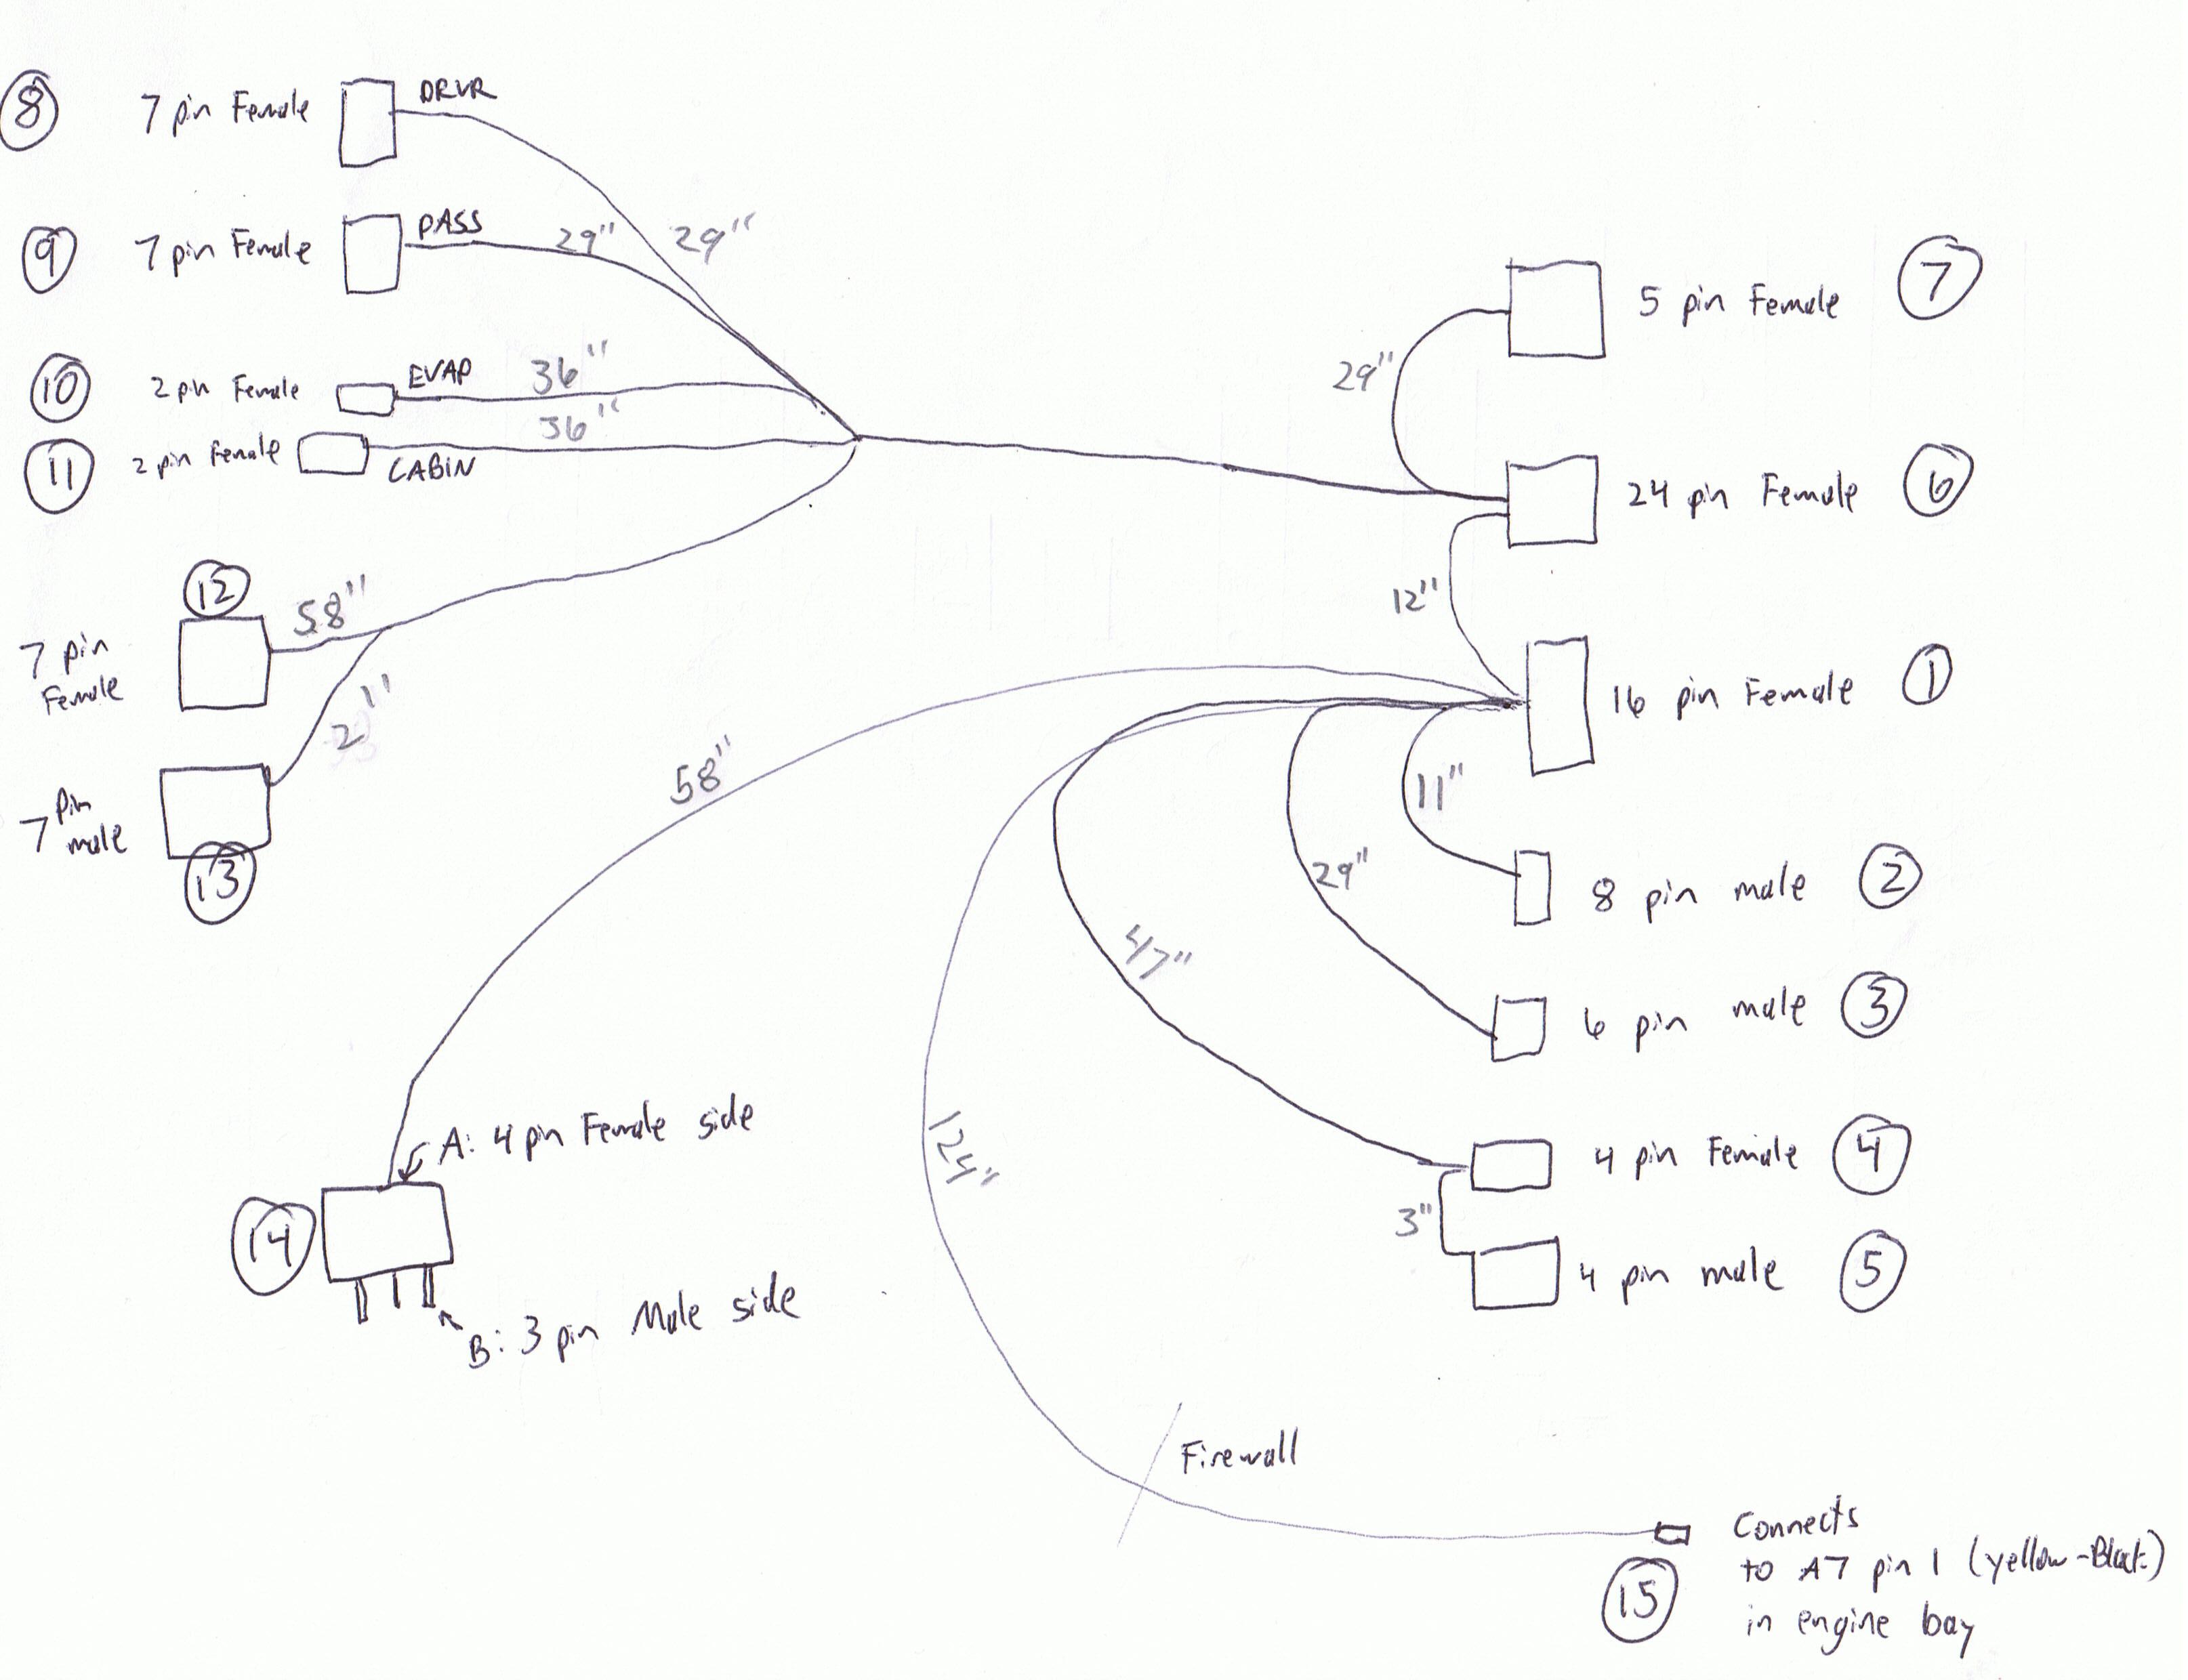 rudy ac control wiring diagram wiring diagram and schematics Mercury Gauge Wiring Harness Mercury Wiring Harness Diagram